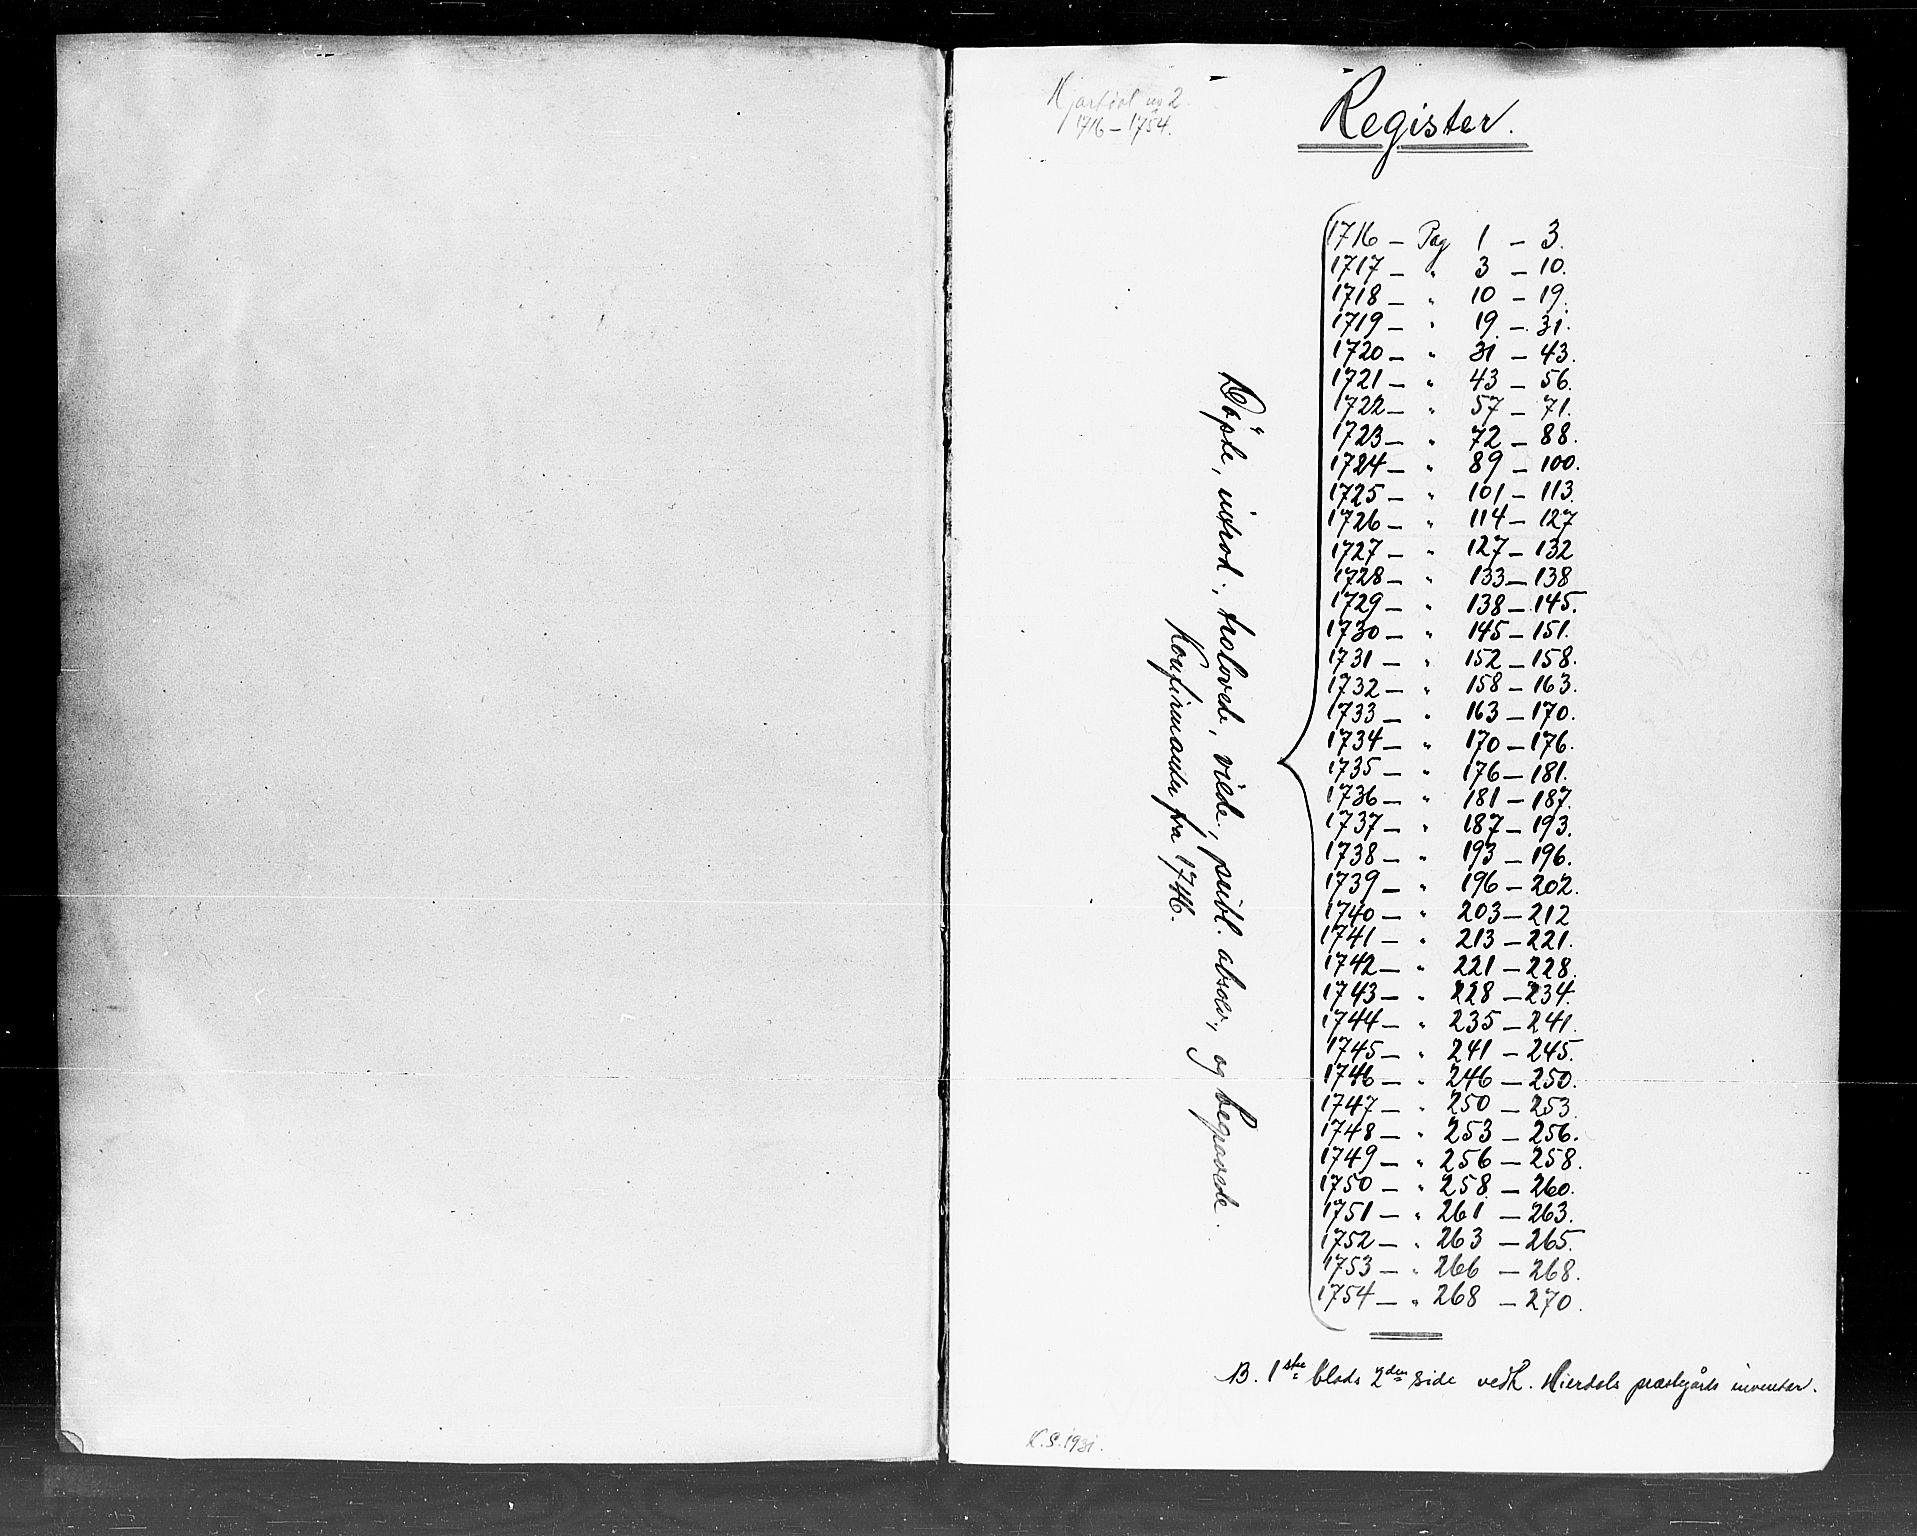 SAKO, Hjartdal kirkebøker, F/Fa/L0002: Ministerialbok nr. I 2, 1716-1754